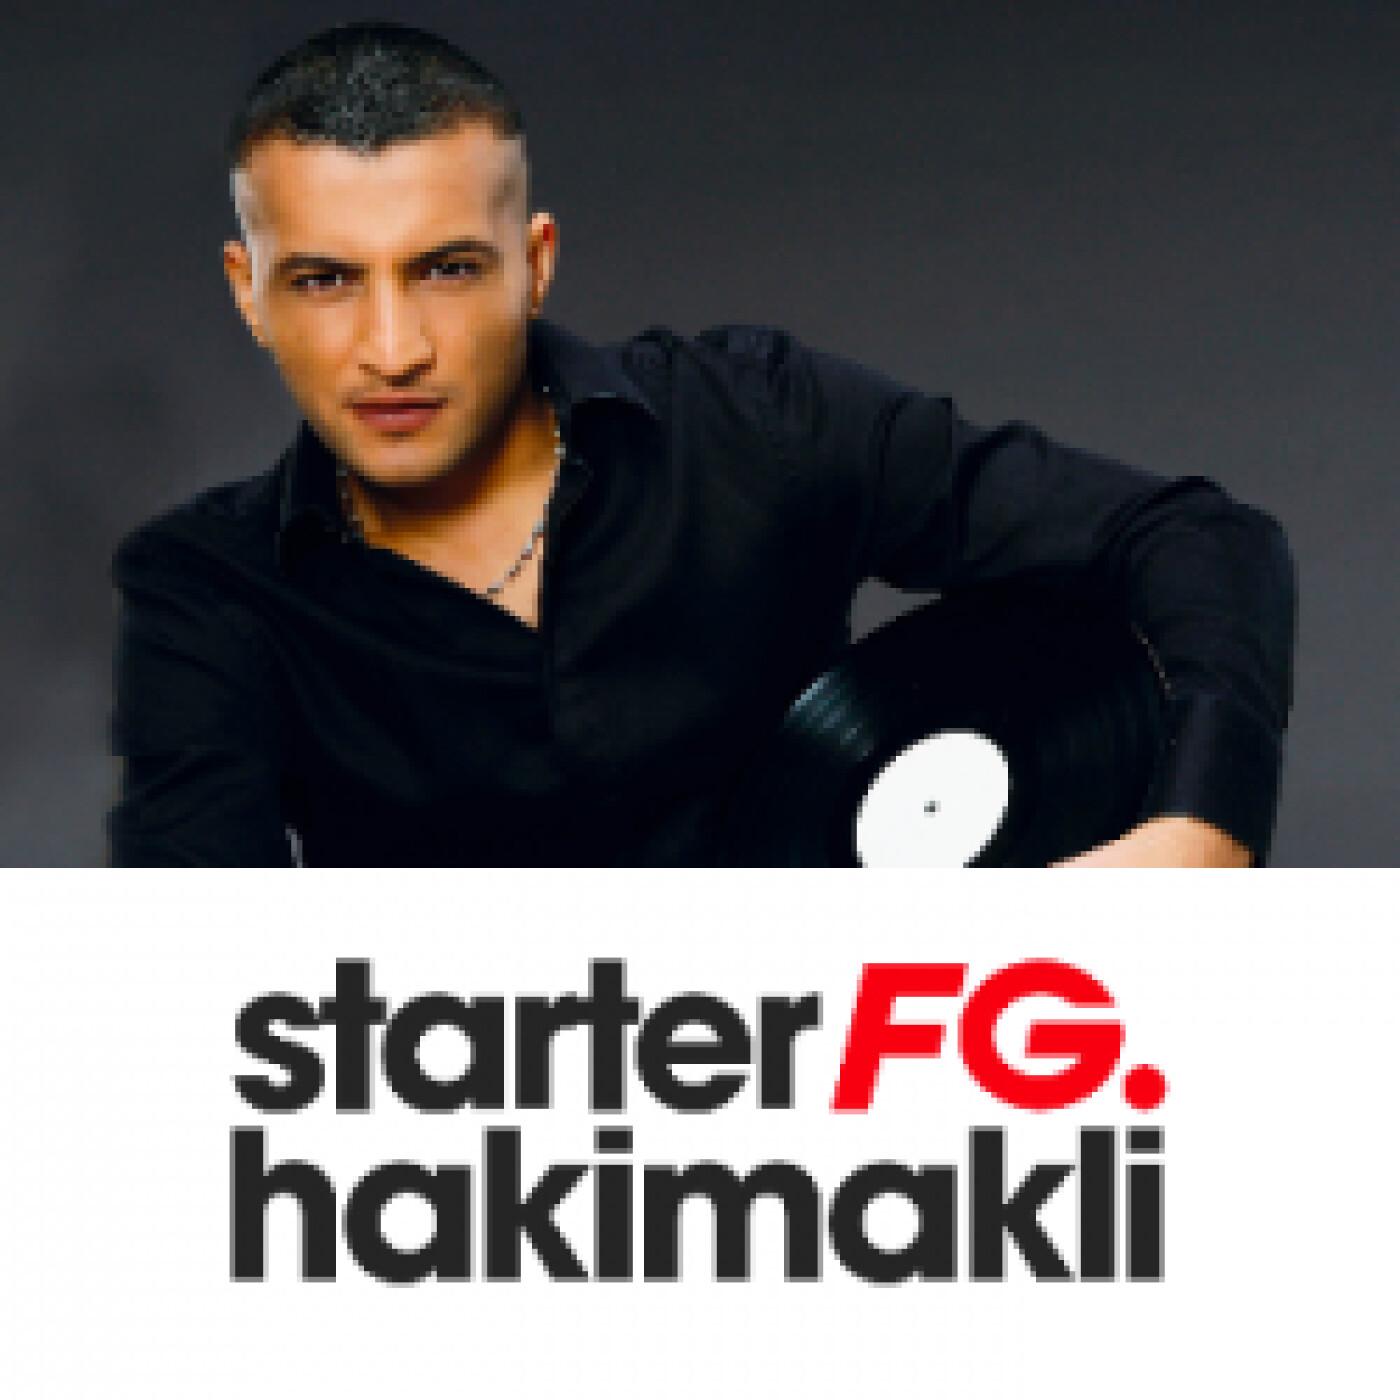 STARTER FG BY HAKIMAKLI JEUDI 17 JUIN 2021